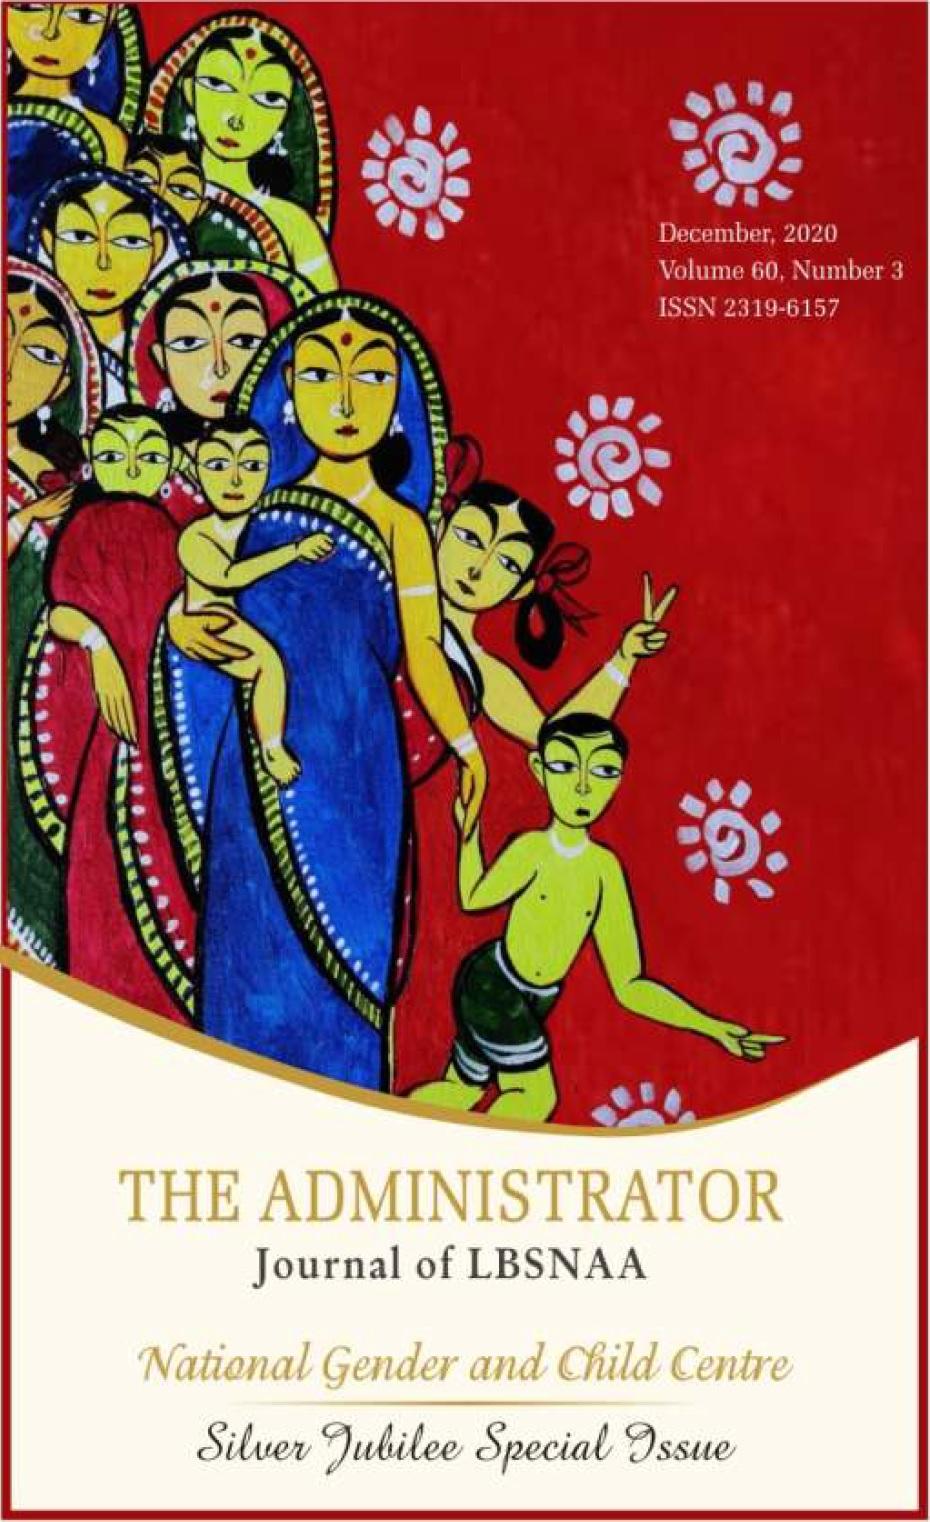 The Administrator Volume 60, Number 3 December, 2020